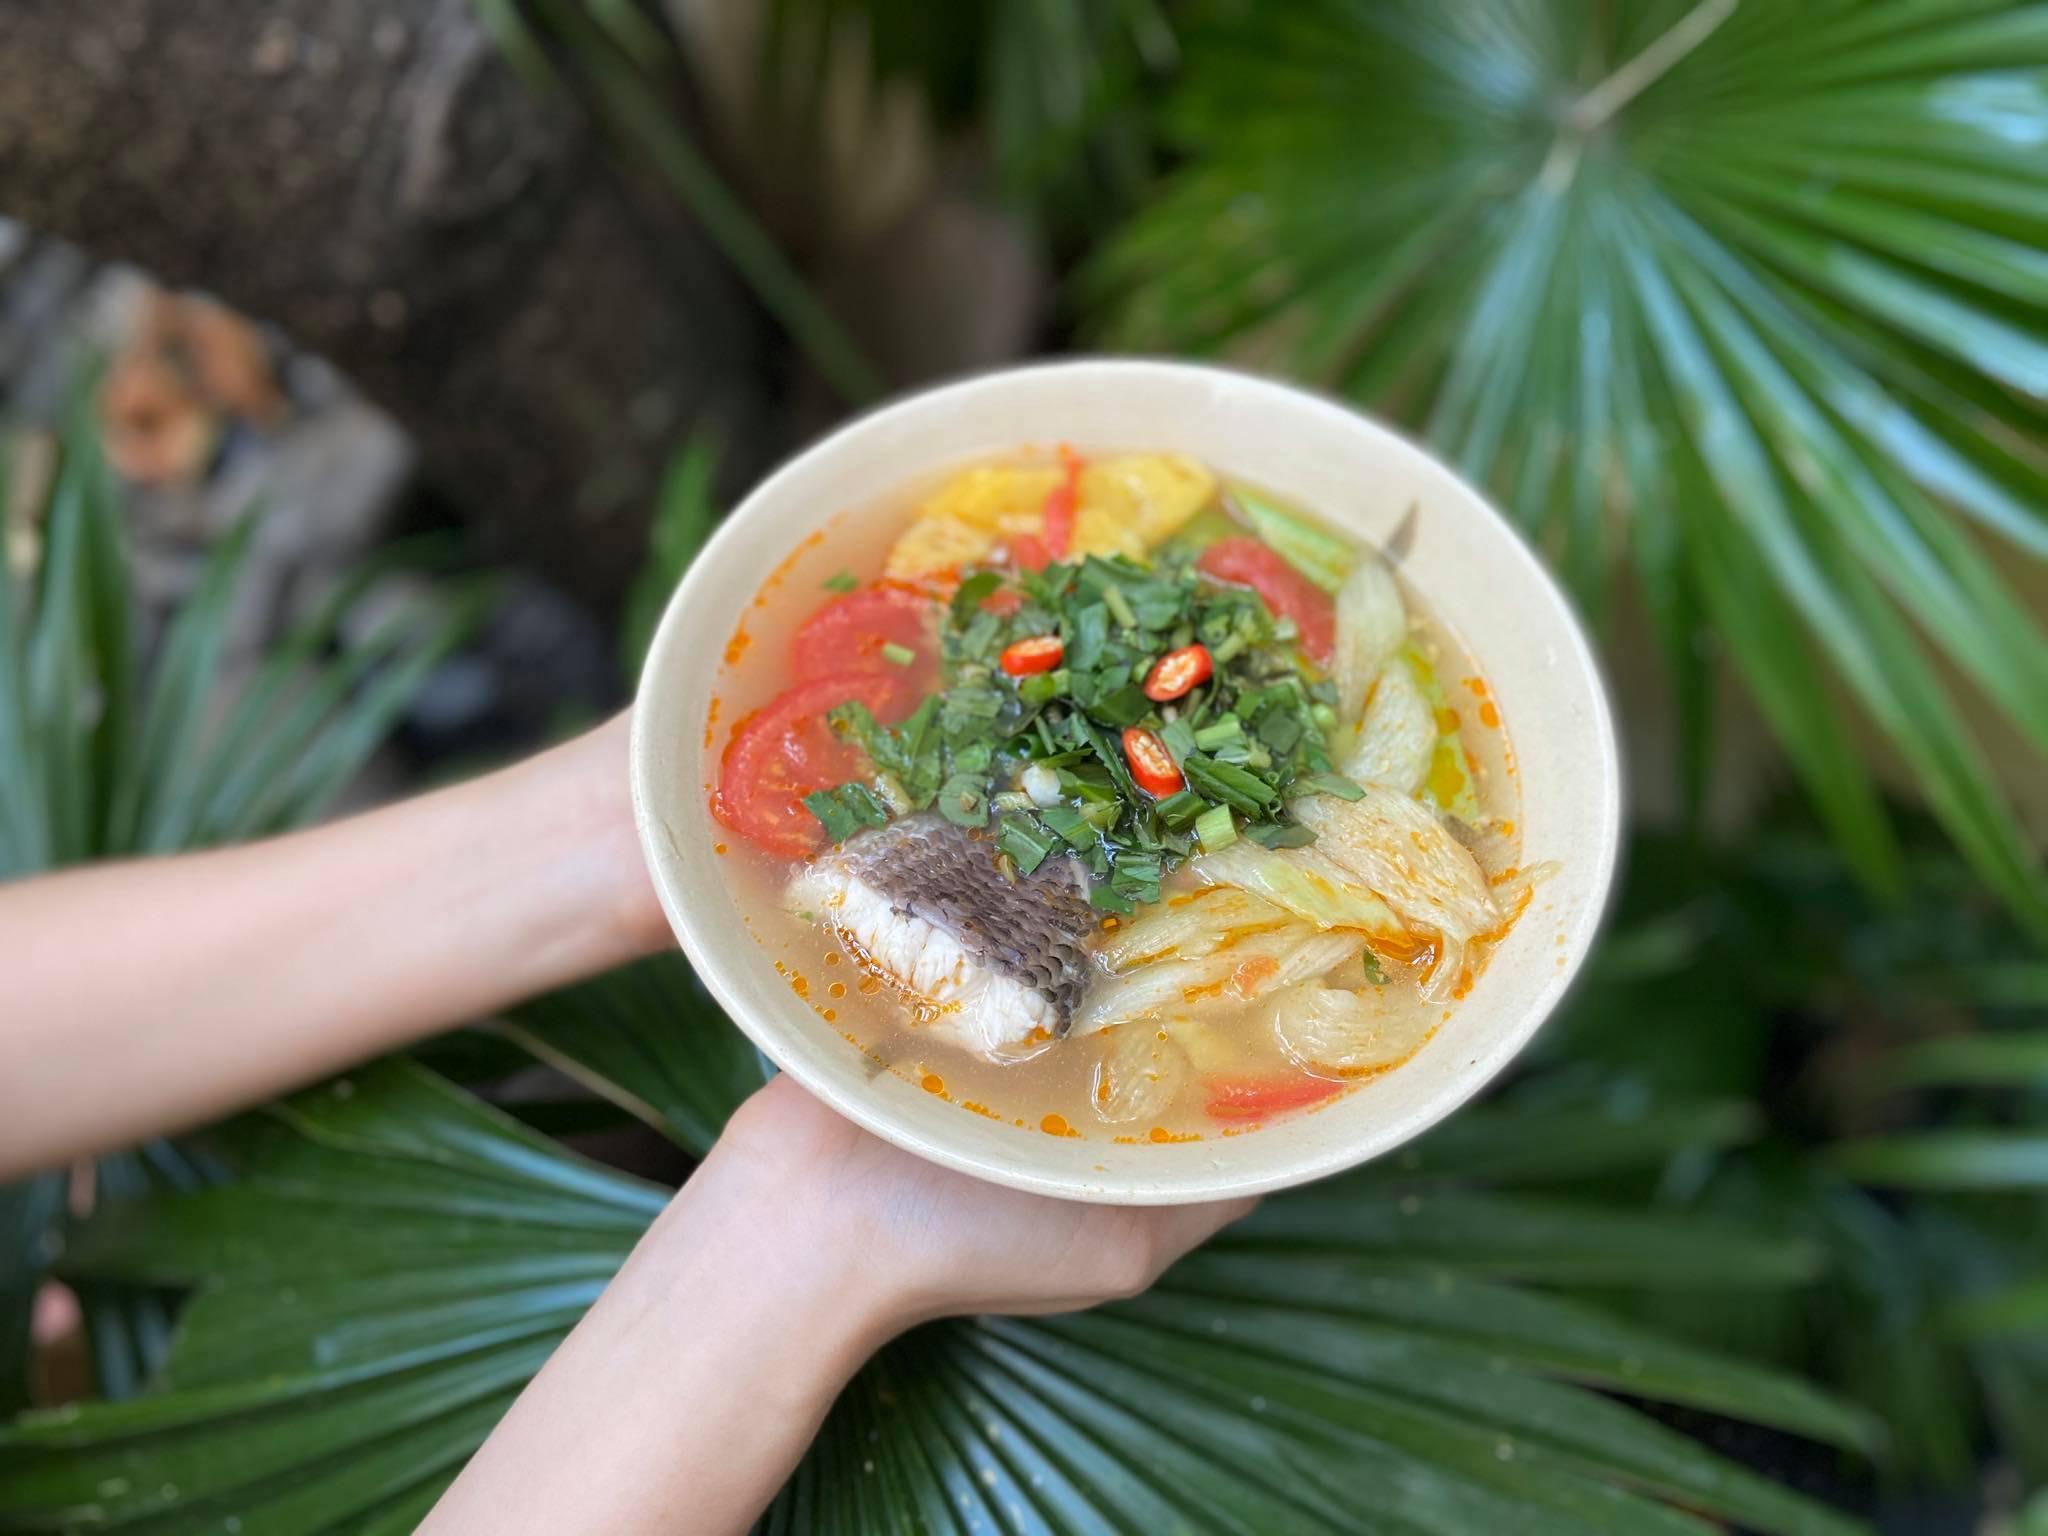 Delicious vietnamese homemade food